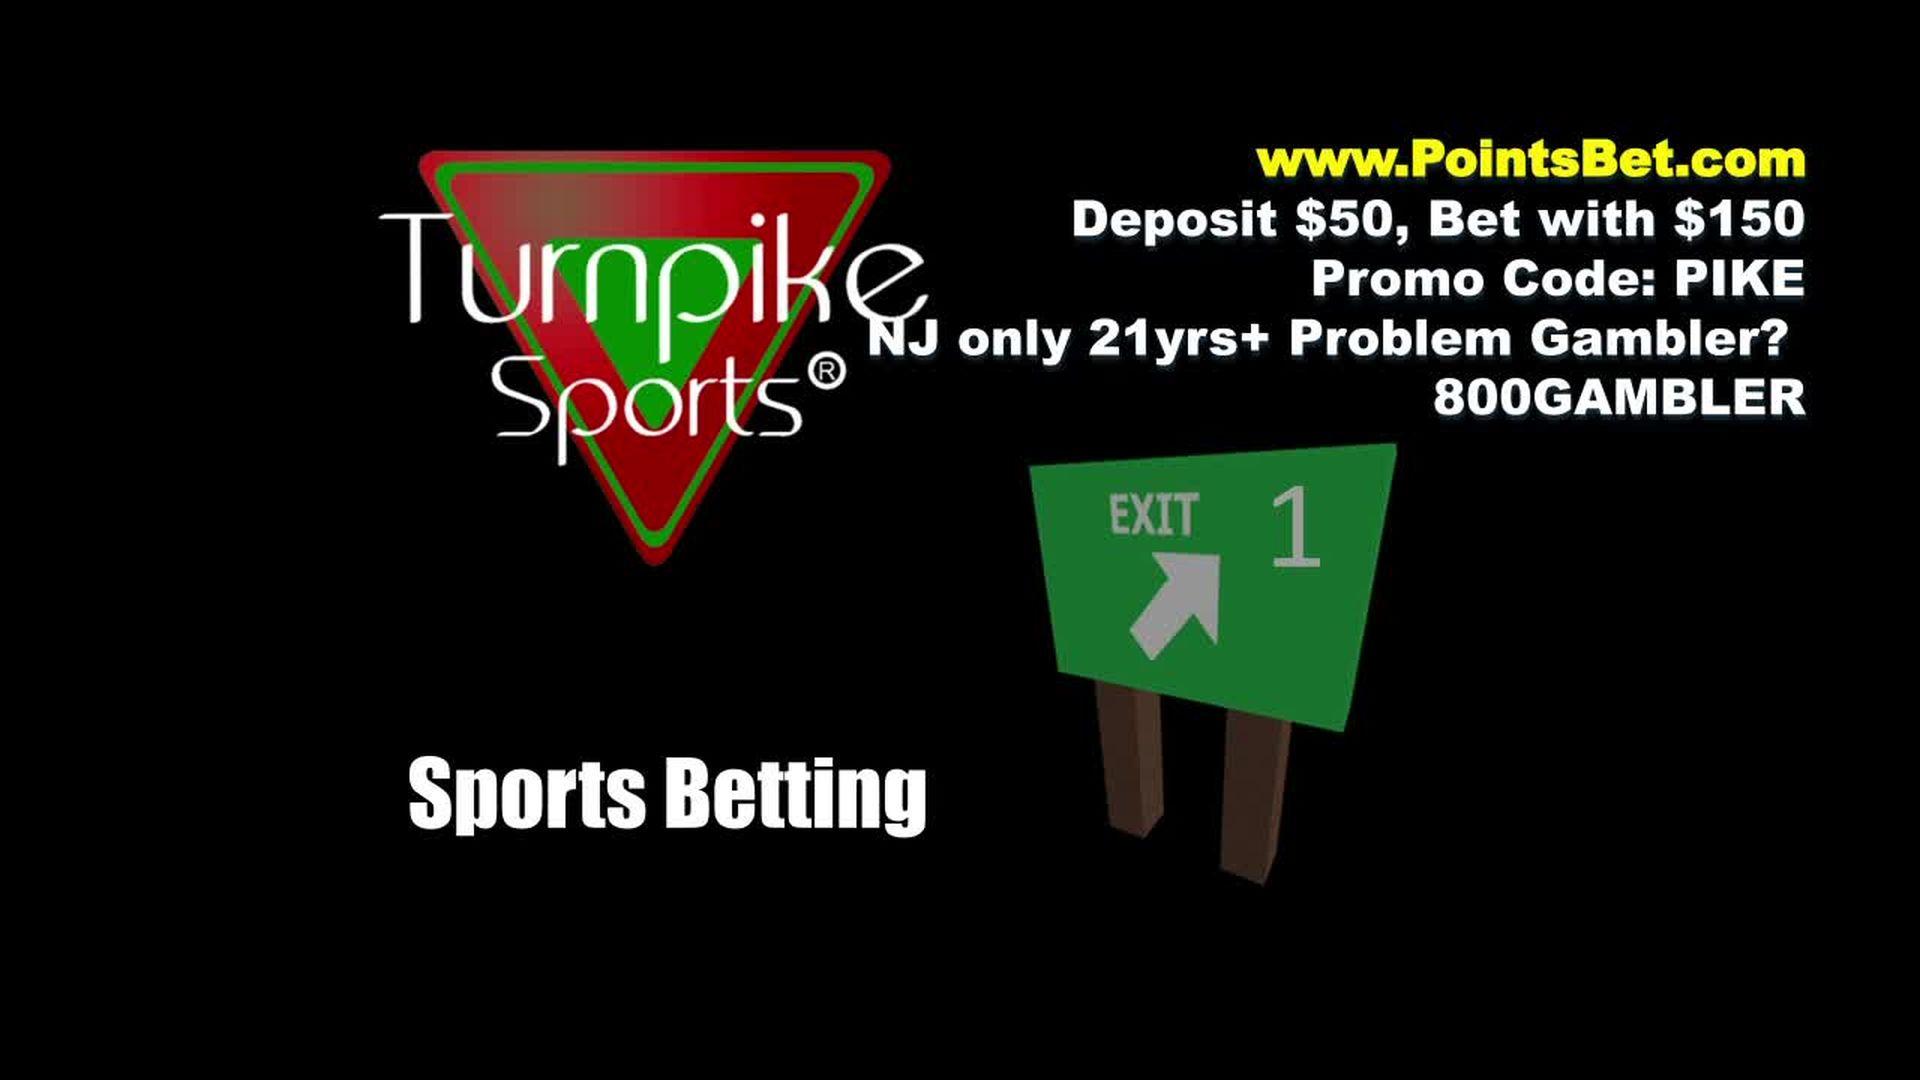 Turnpike Sports® - S 4 - Ep 4